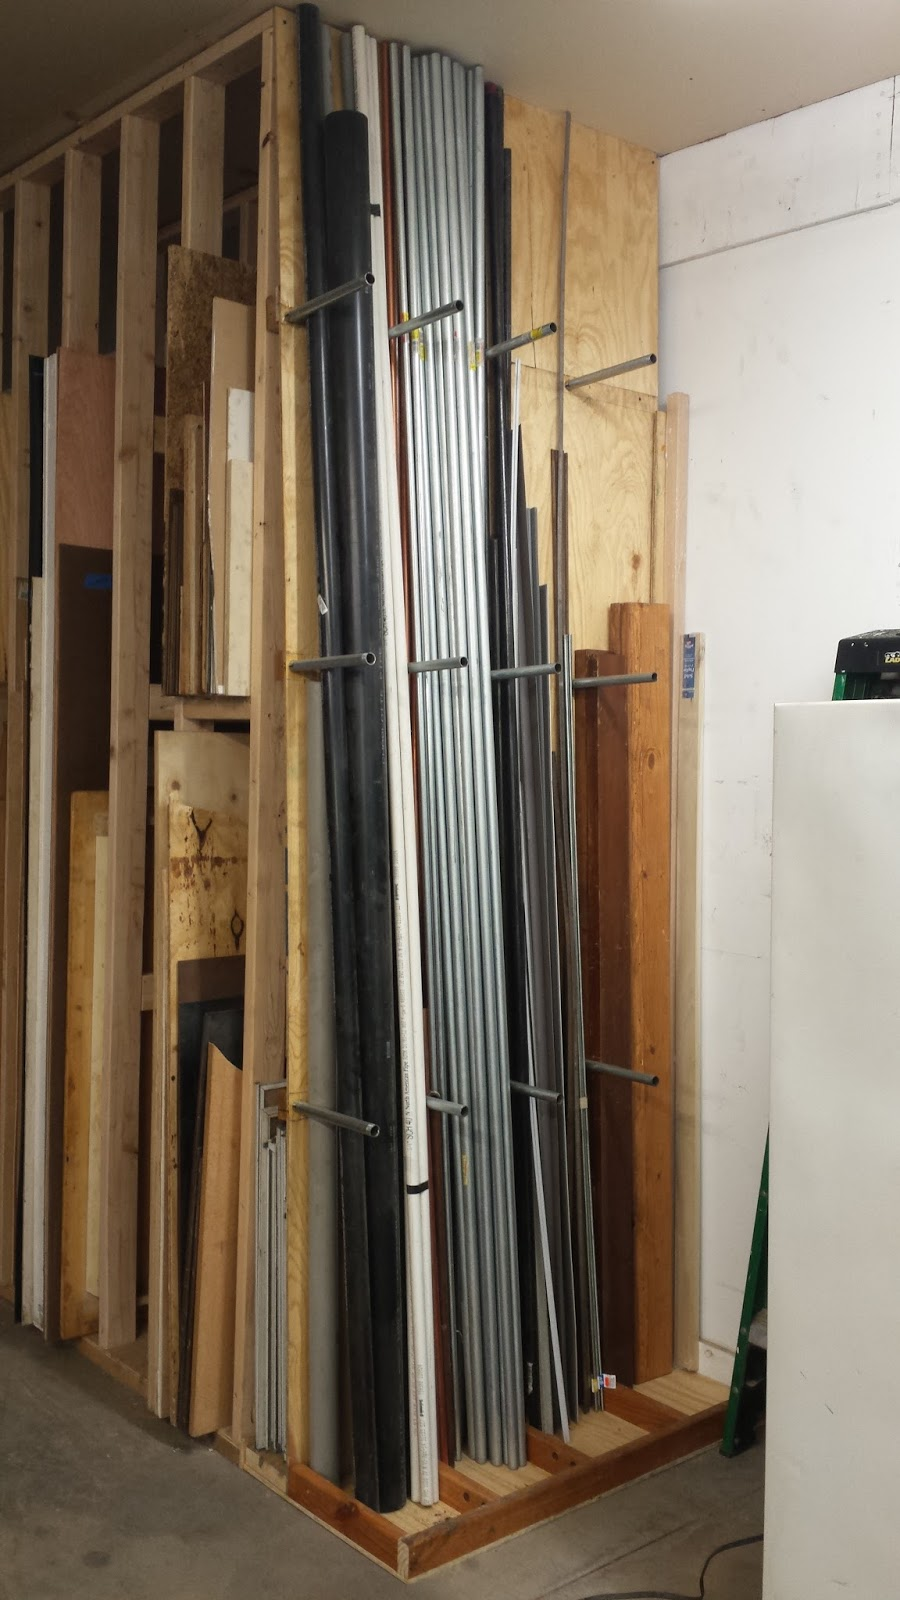 Vertical Pipe Storage Rack & MRX Designs: Vertical Pipe Storage Rack